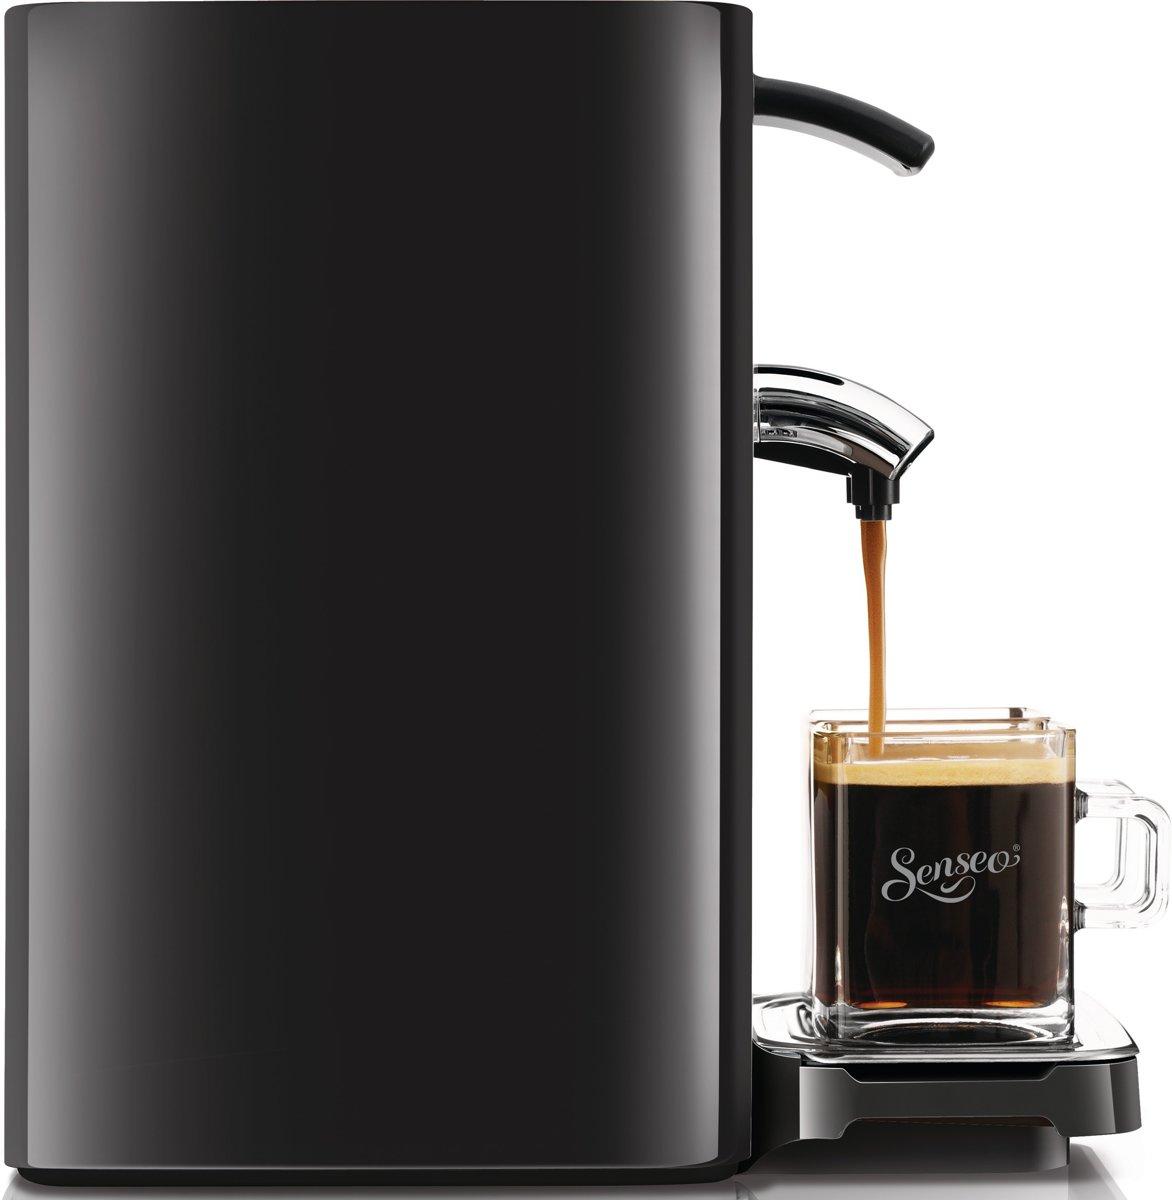 Top bol.com | Philips Senseo Quadrante HD7863/60 - Koffiepadapparaat LS81